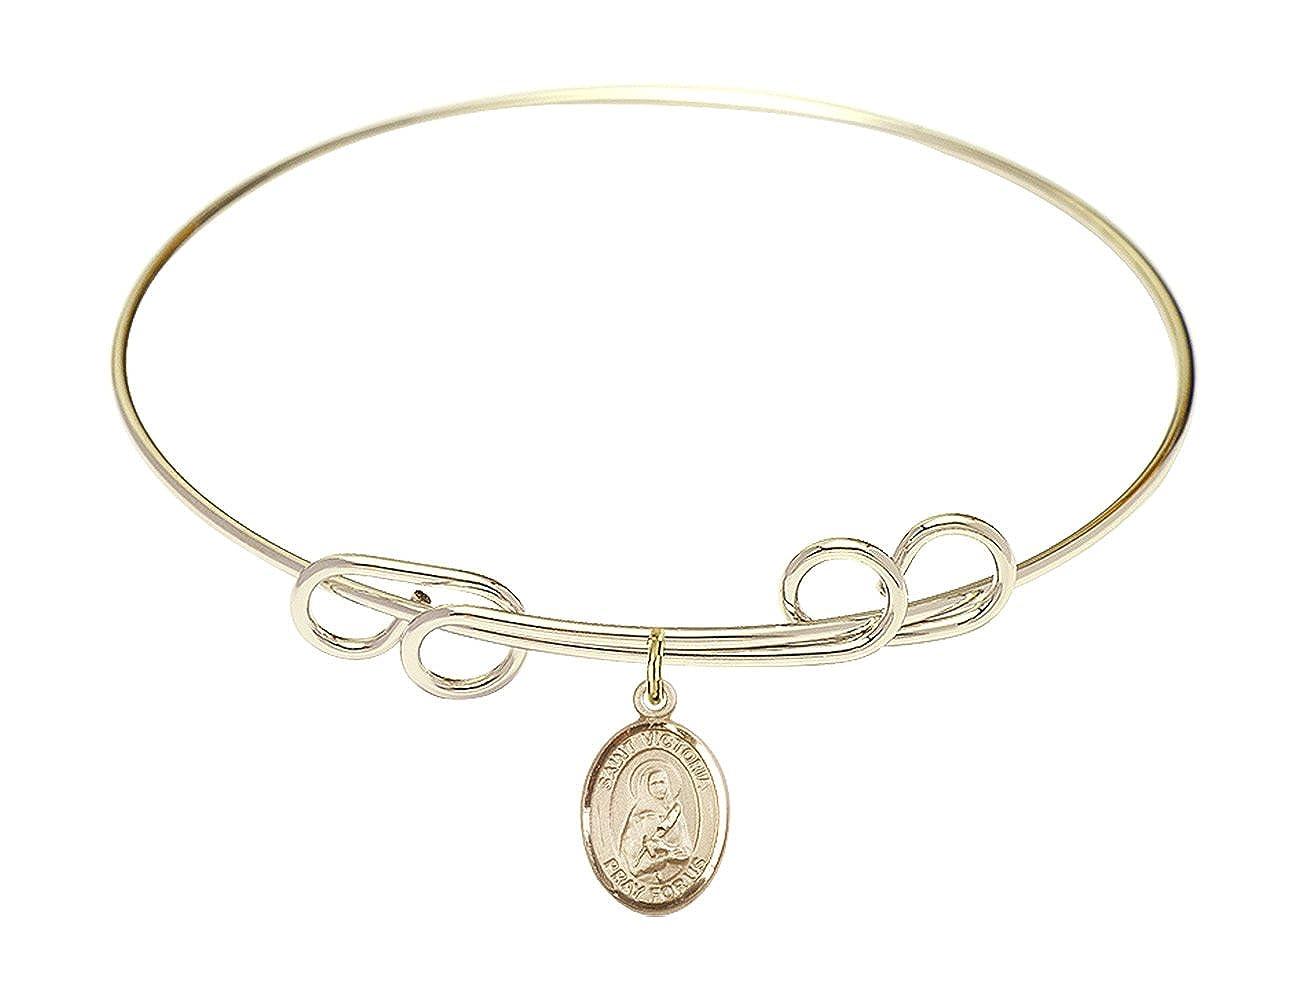 DiamondJewelryNY Double Loop Bangle Bracelet with a St Victoria Charm.